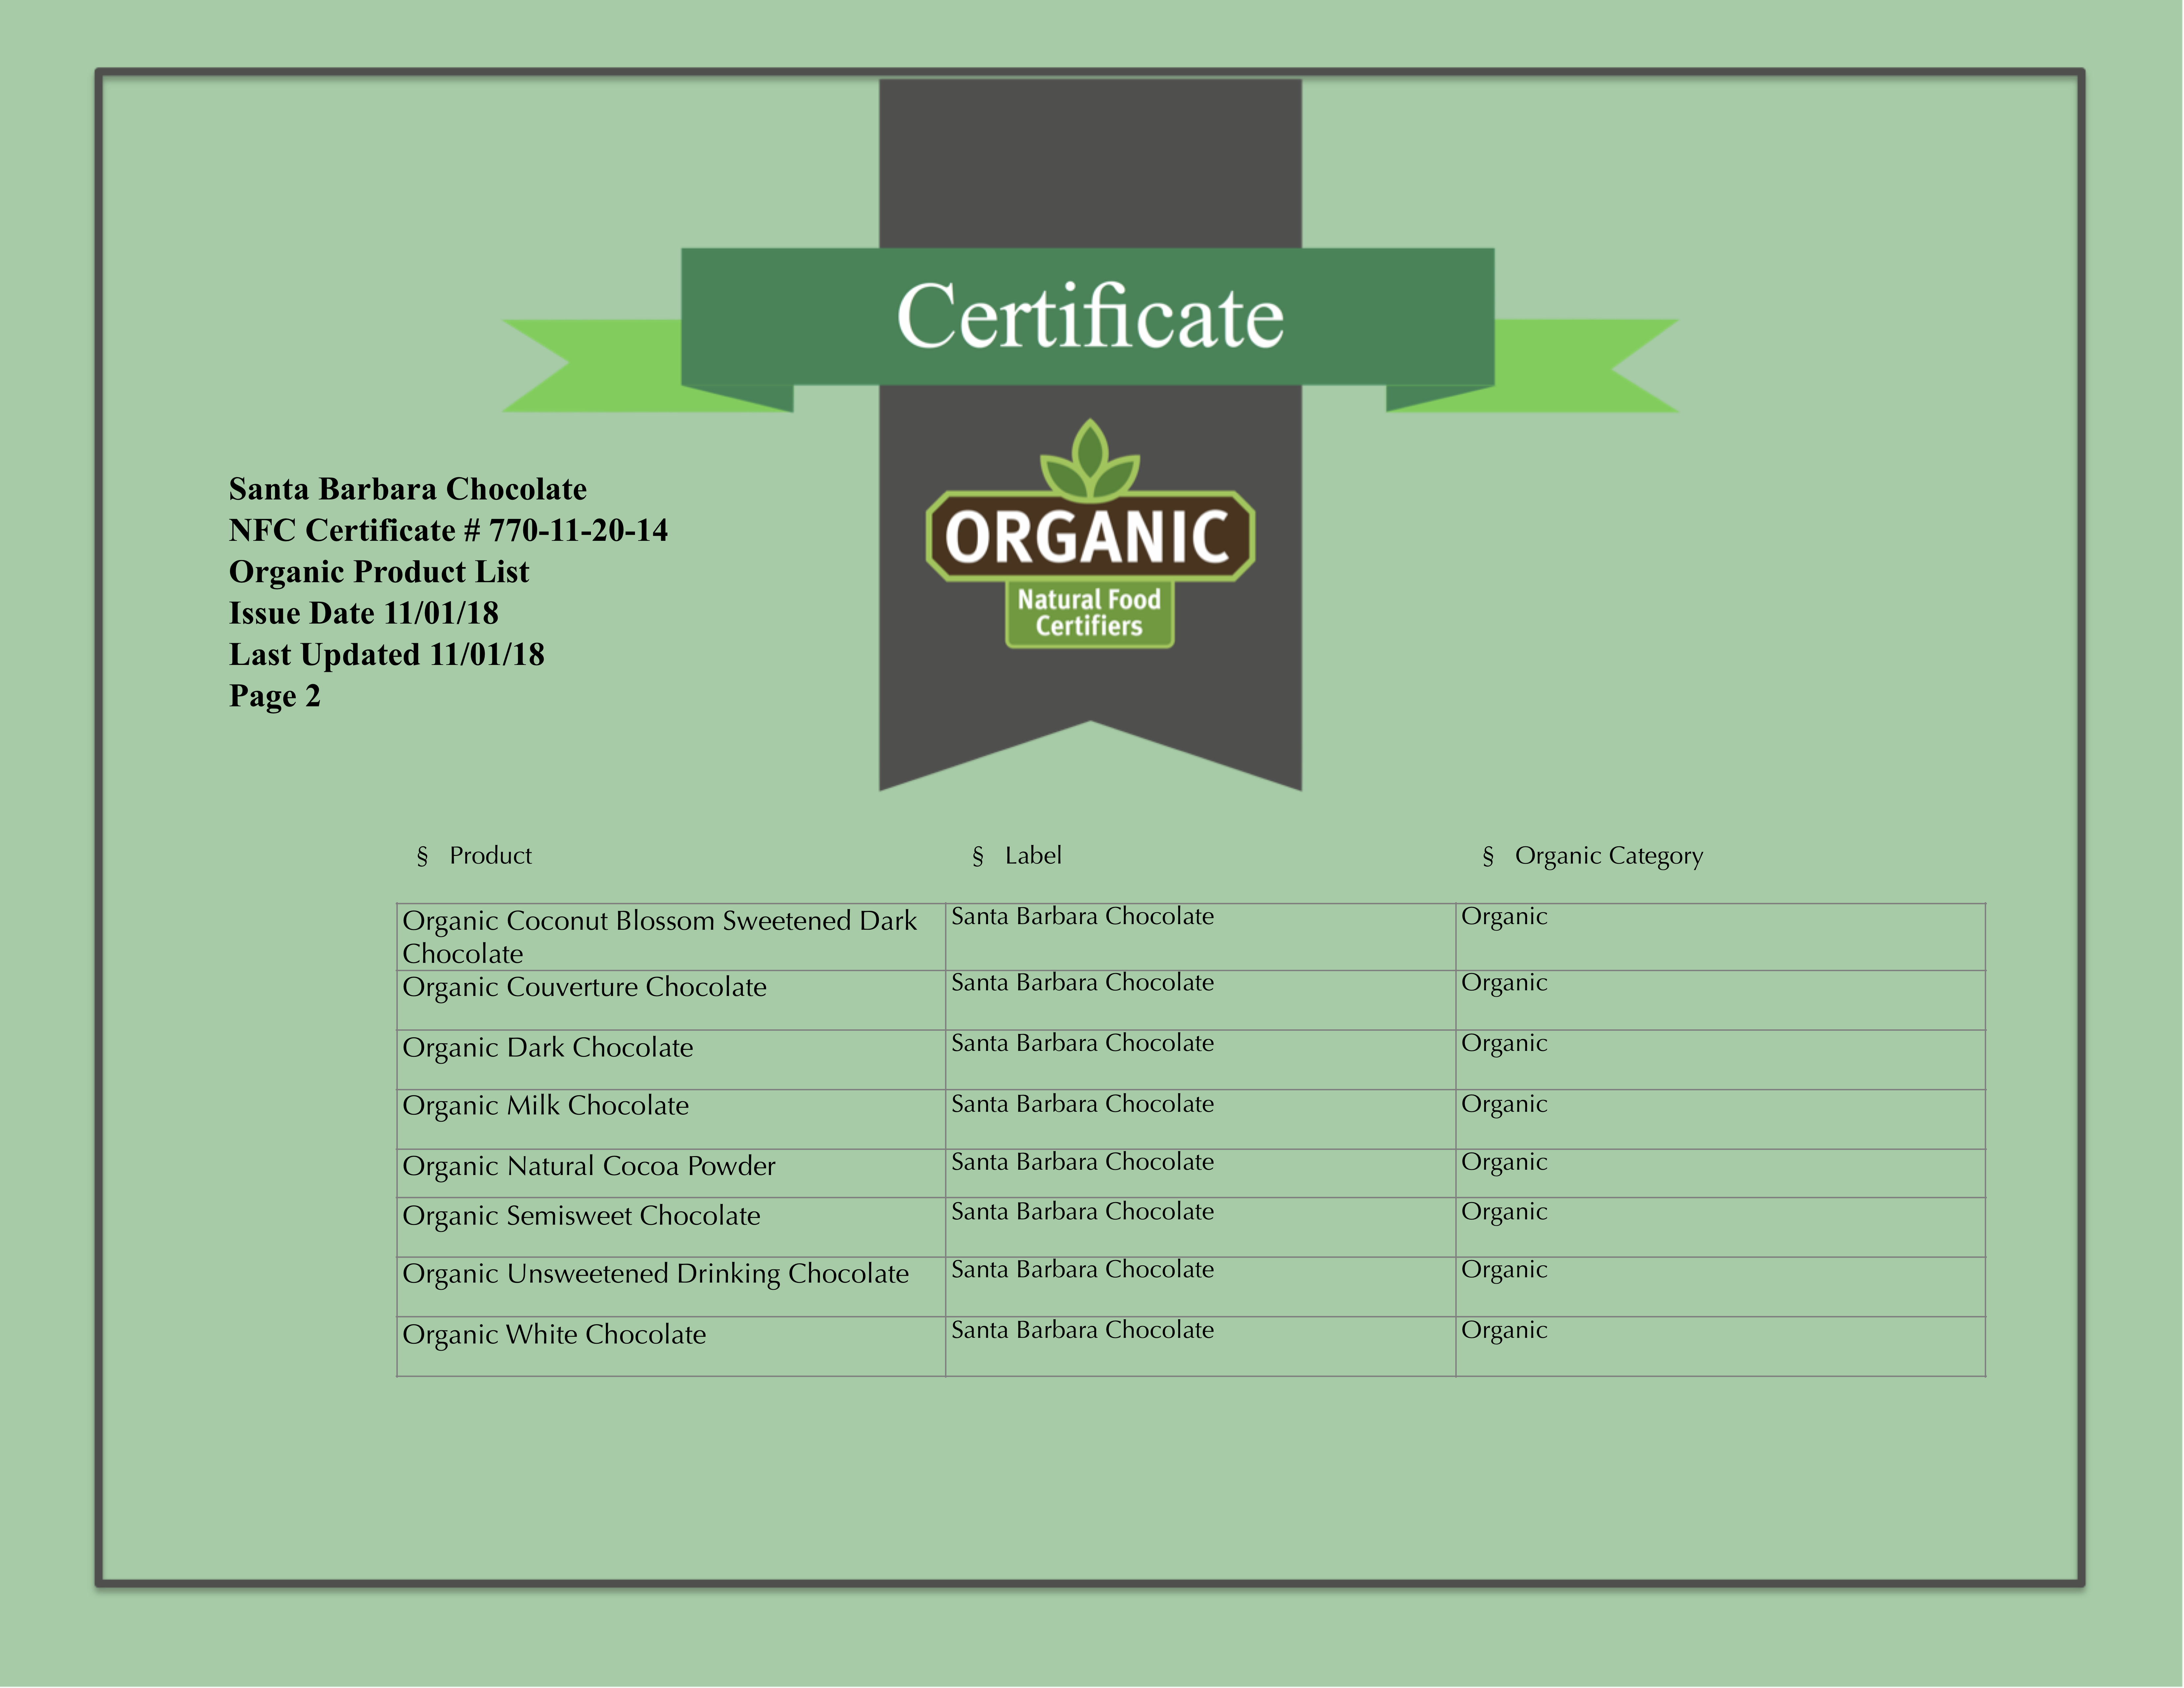 santa-barbara-chocolate-organic-certificate-2018-2019-page-3.jpg